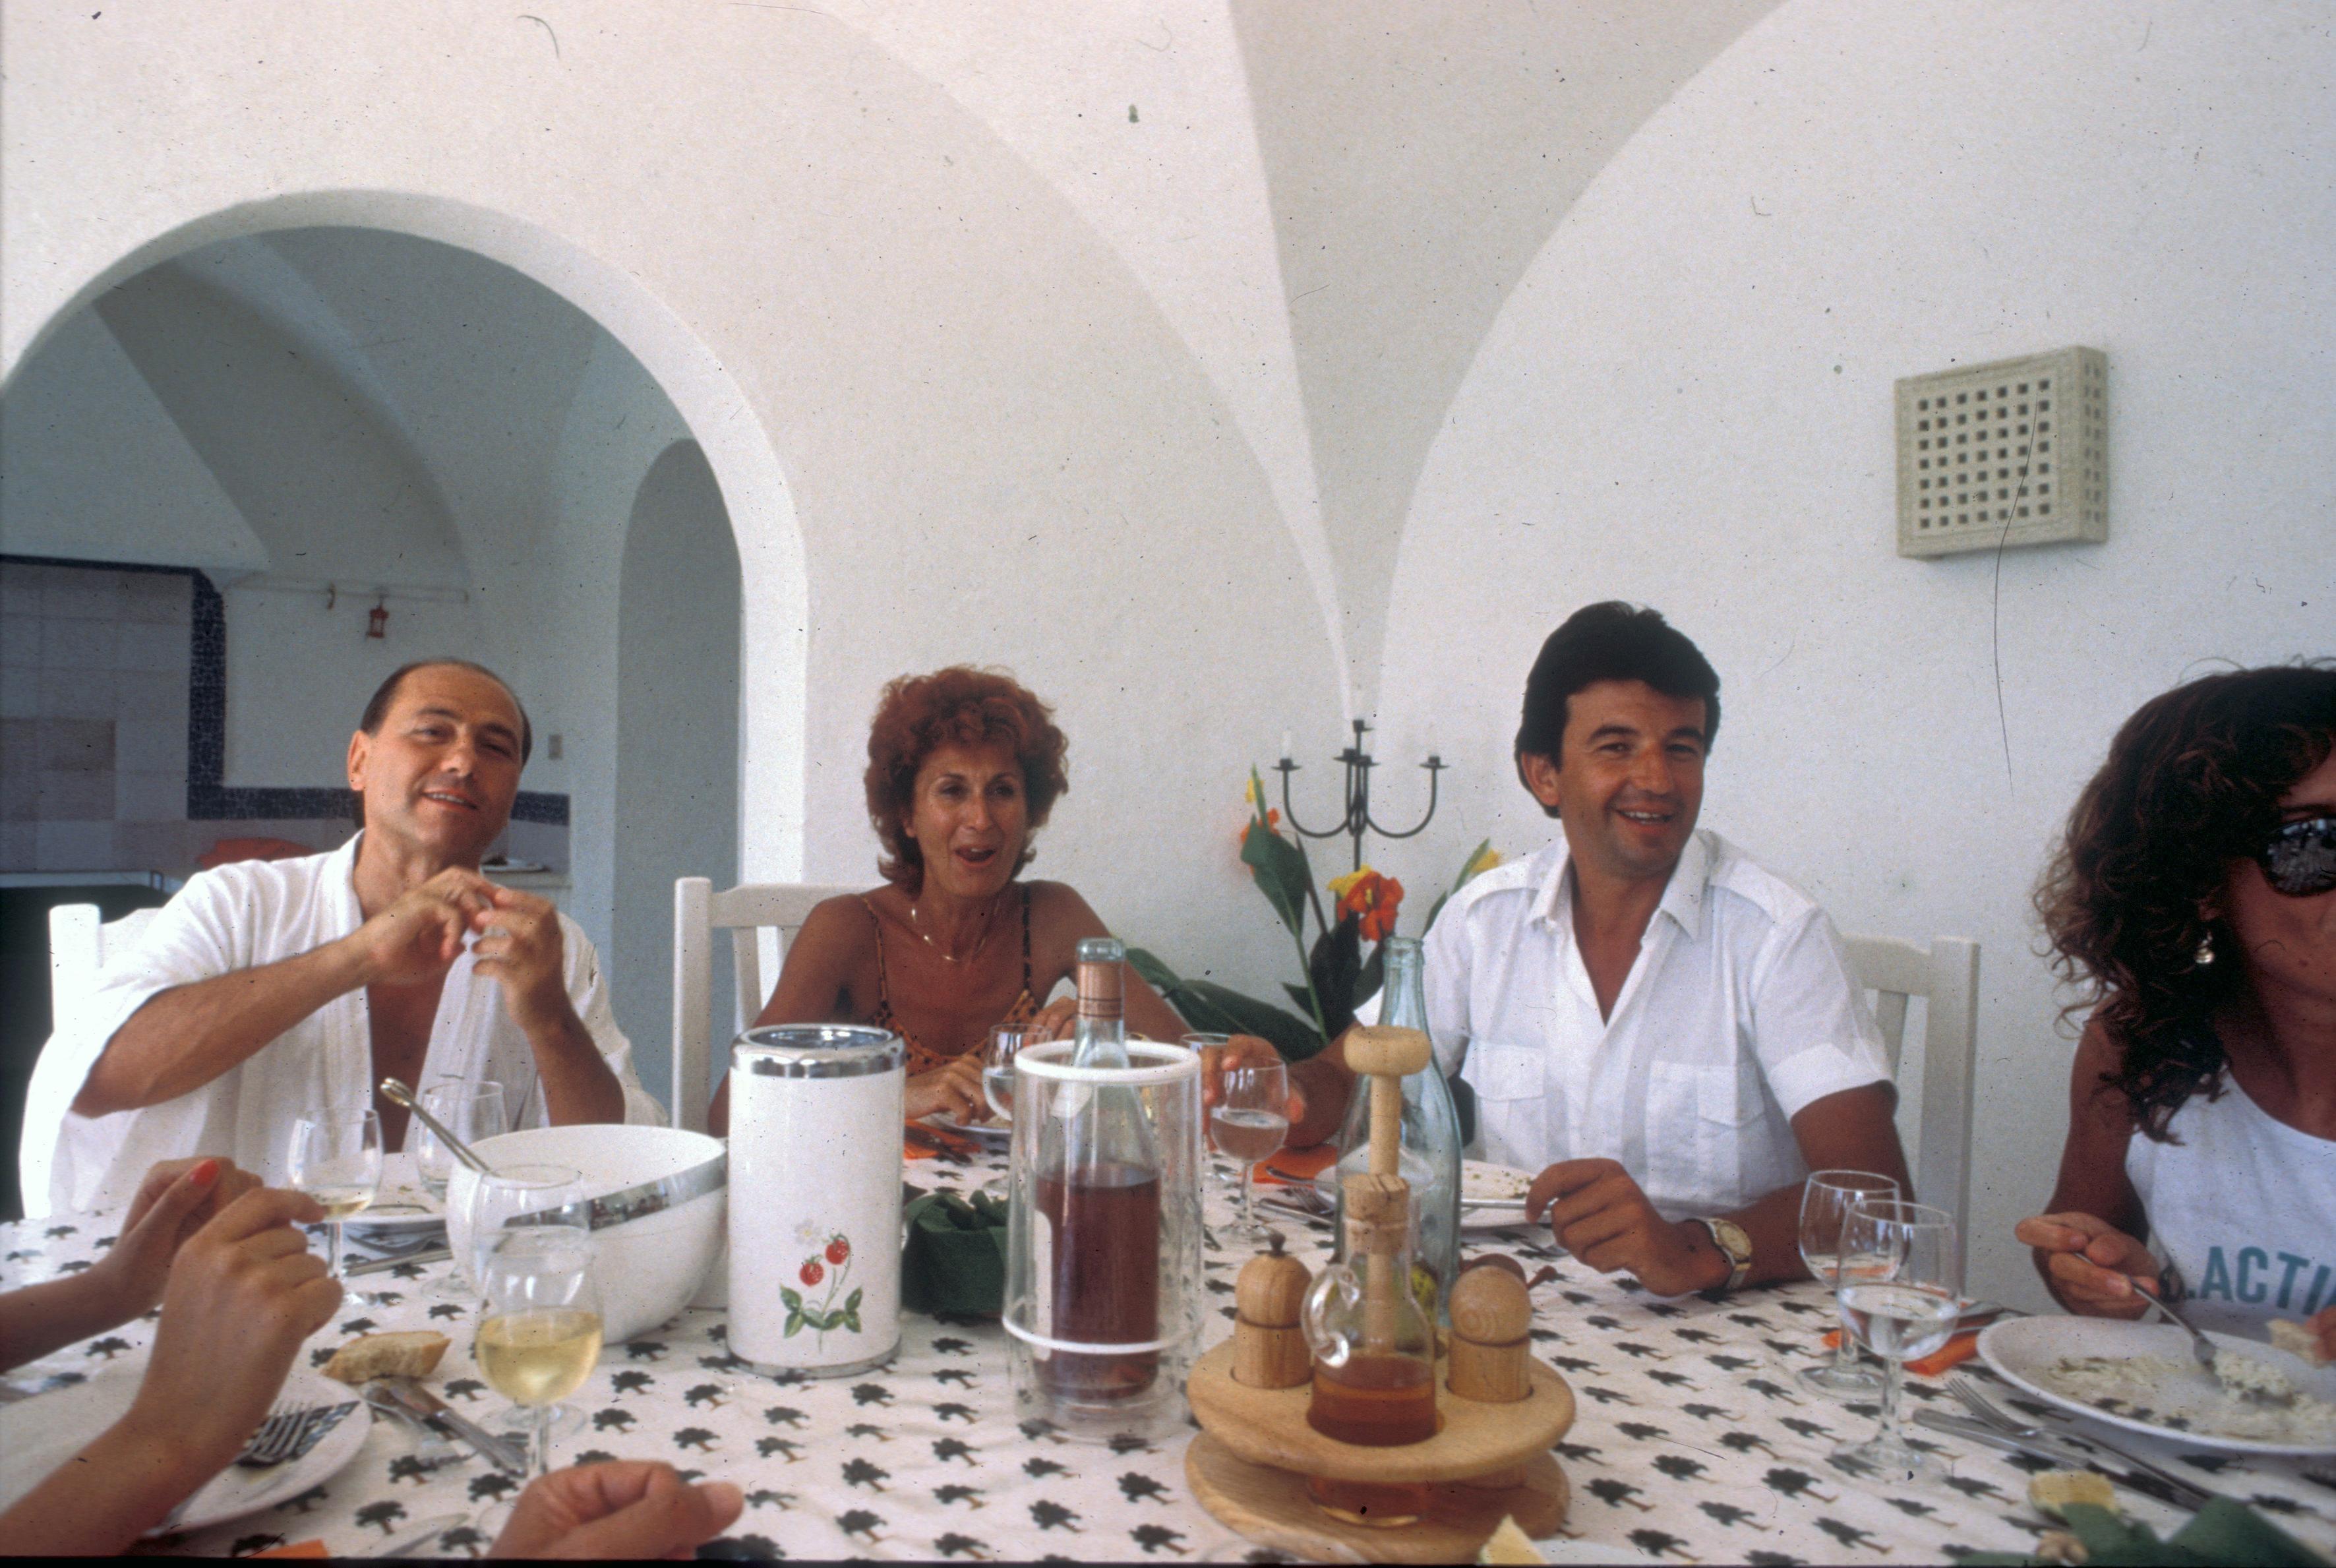 Silvio Berlusconi with Anna Craxi and Tarak Ben Ammar in Hammamet, 1984